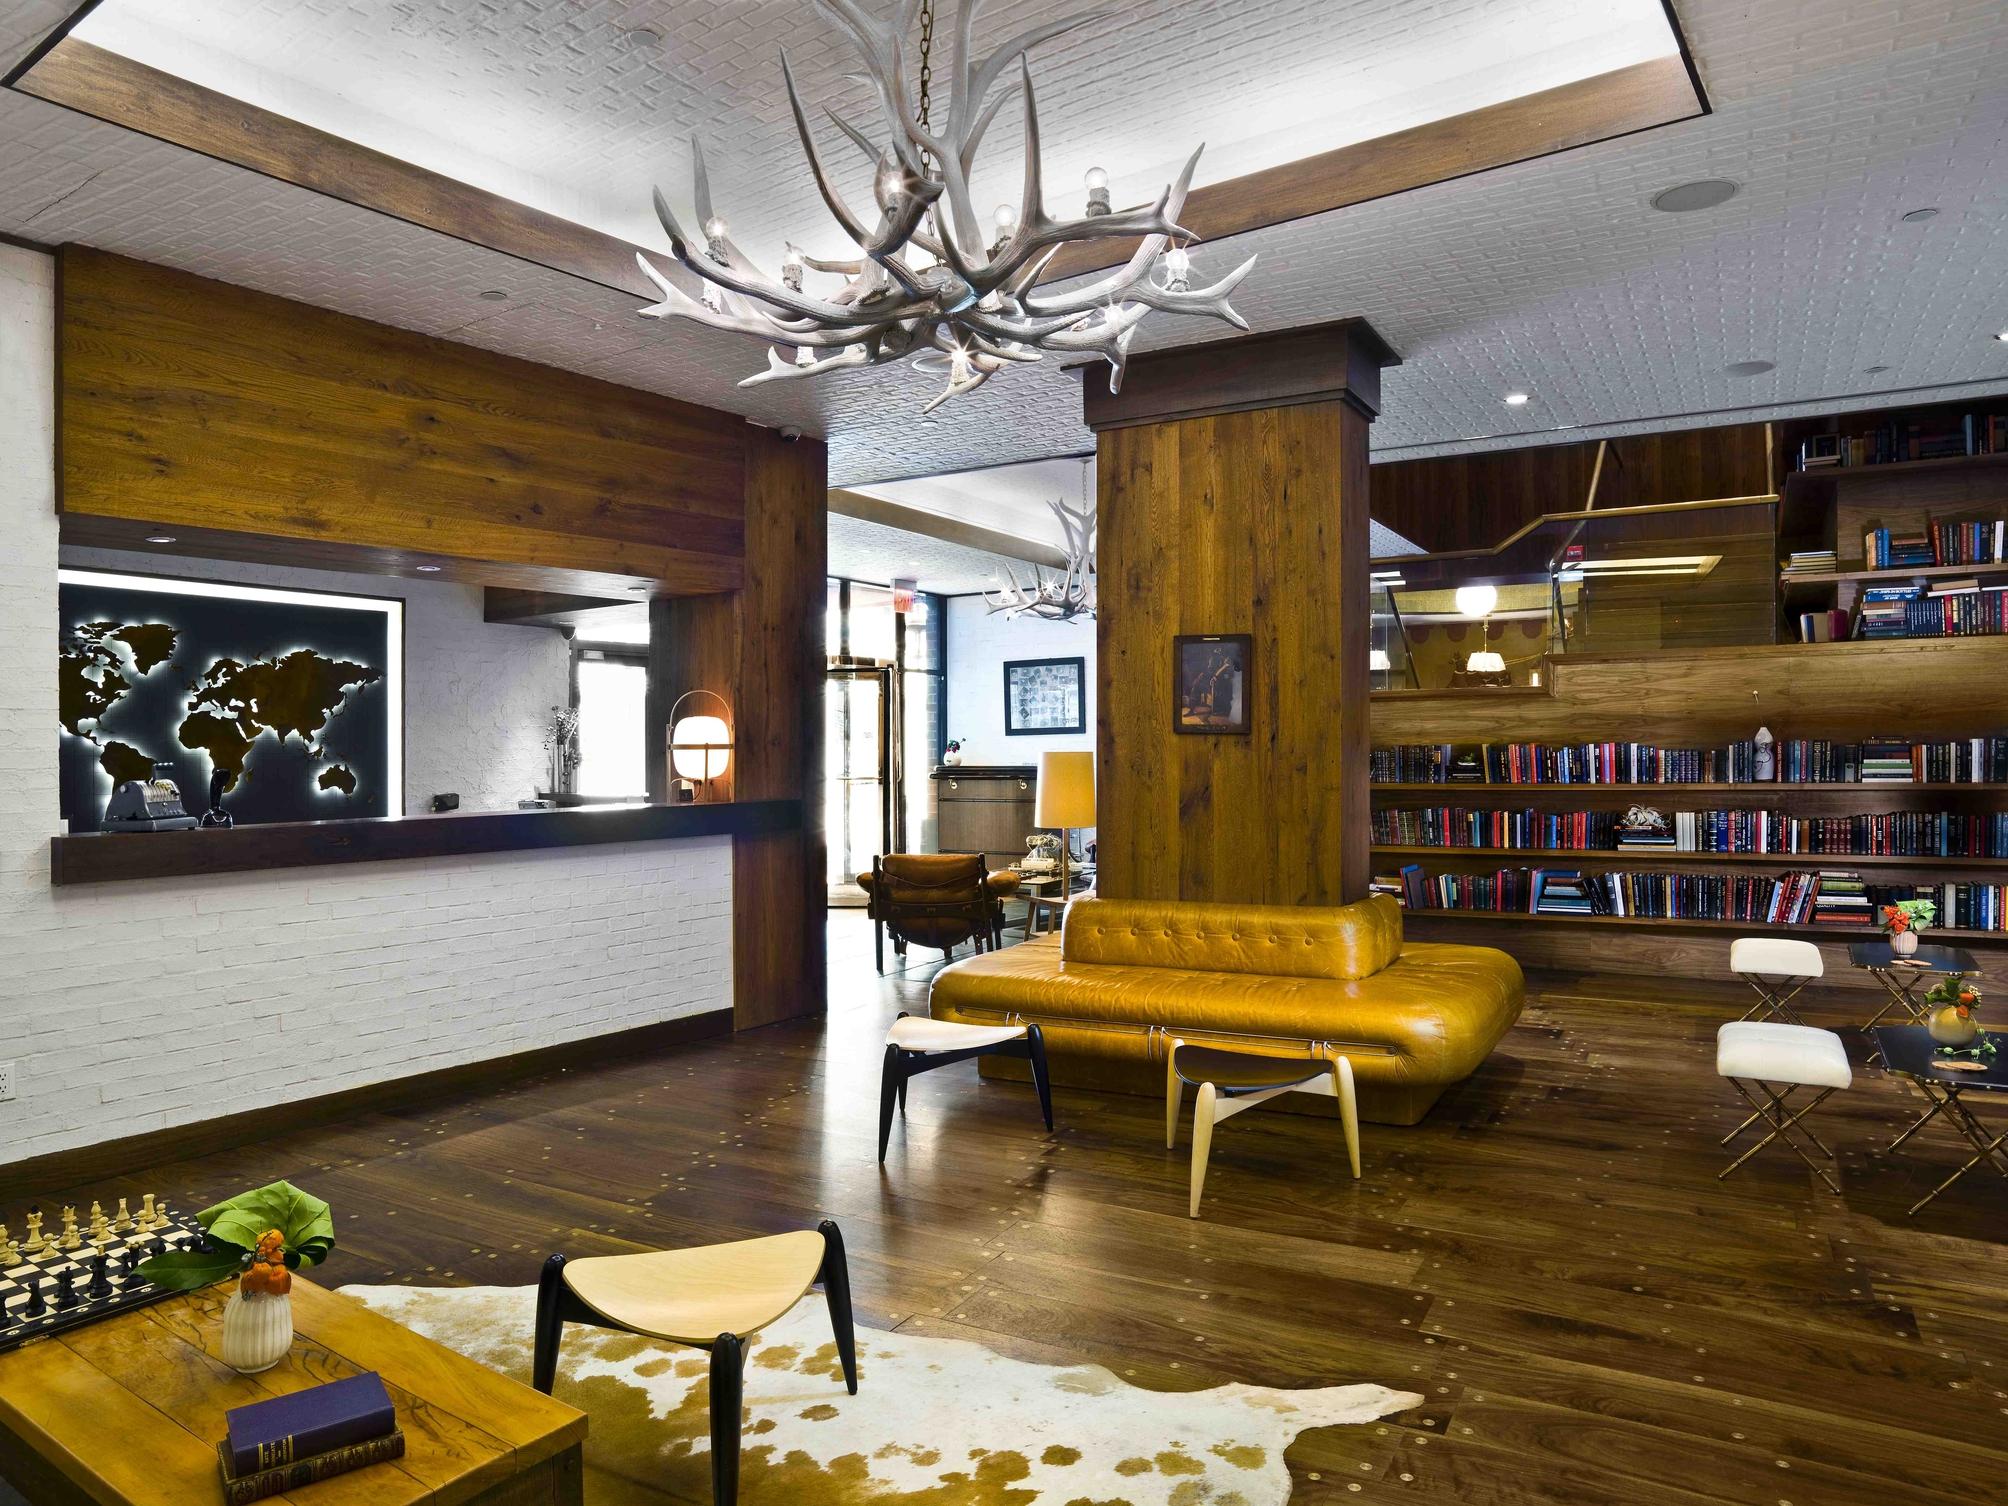 Hotel Gild Hall - A Thompson Hotel